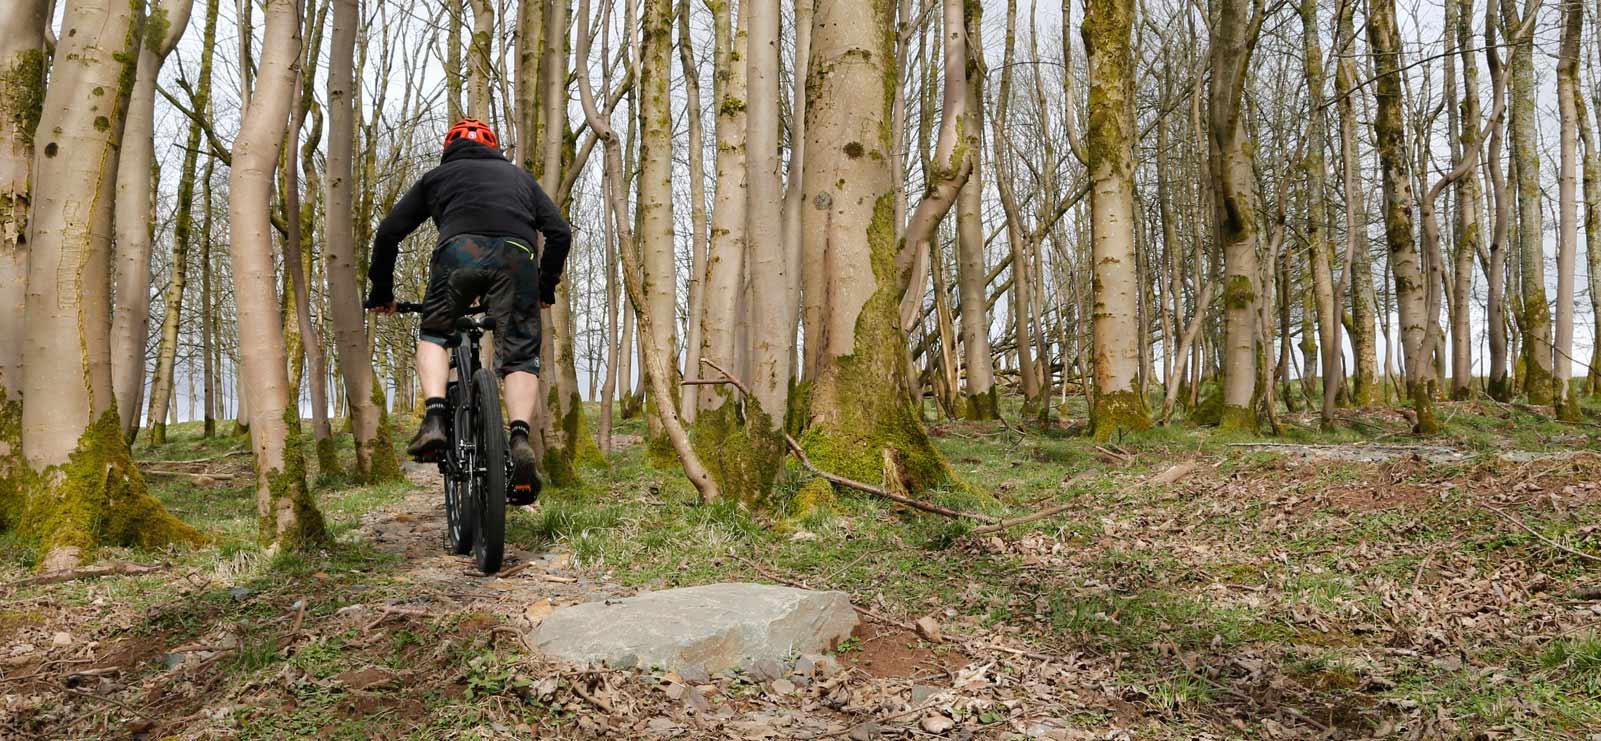 Endura Forrest Trails